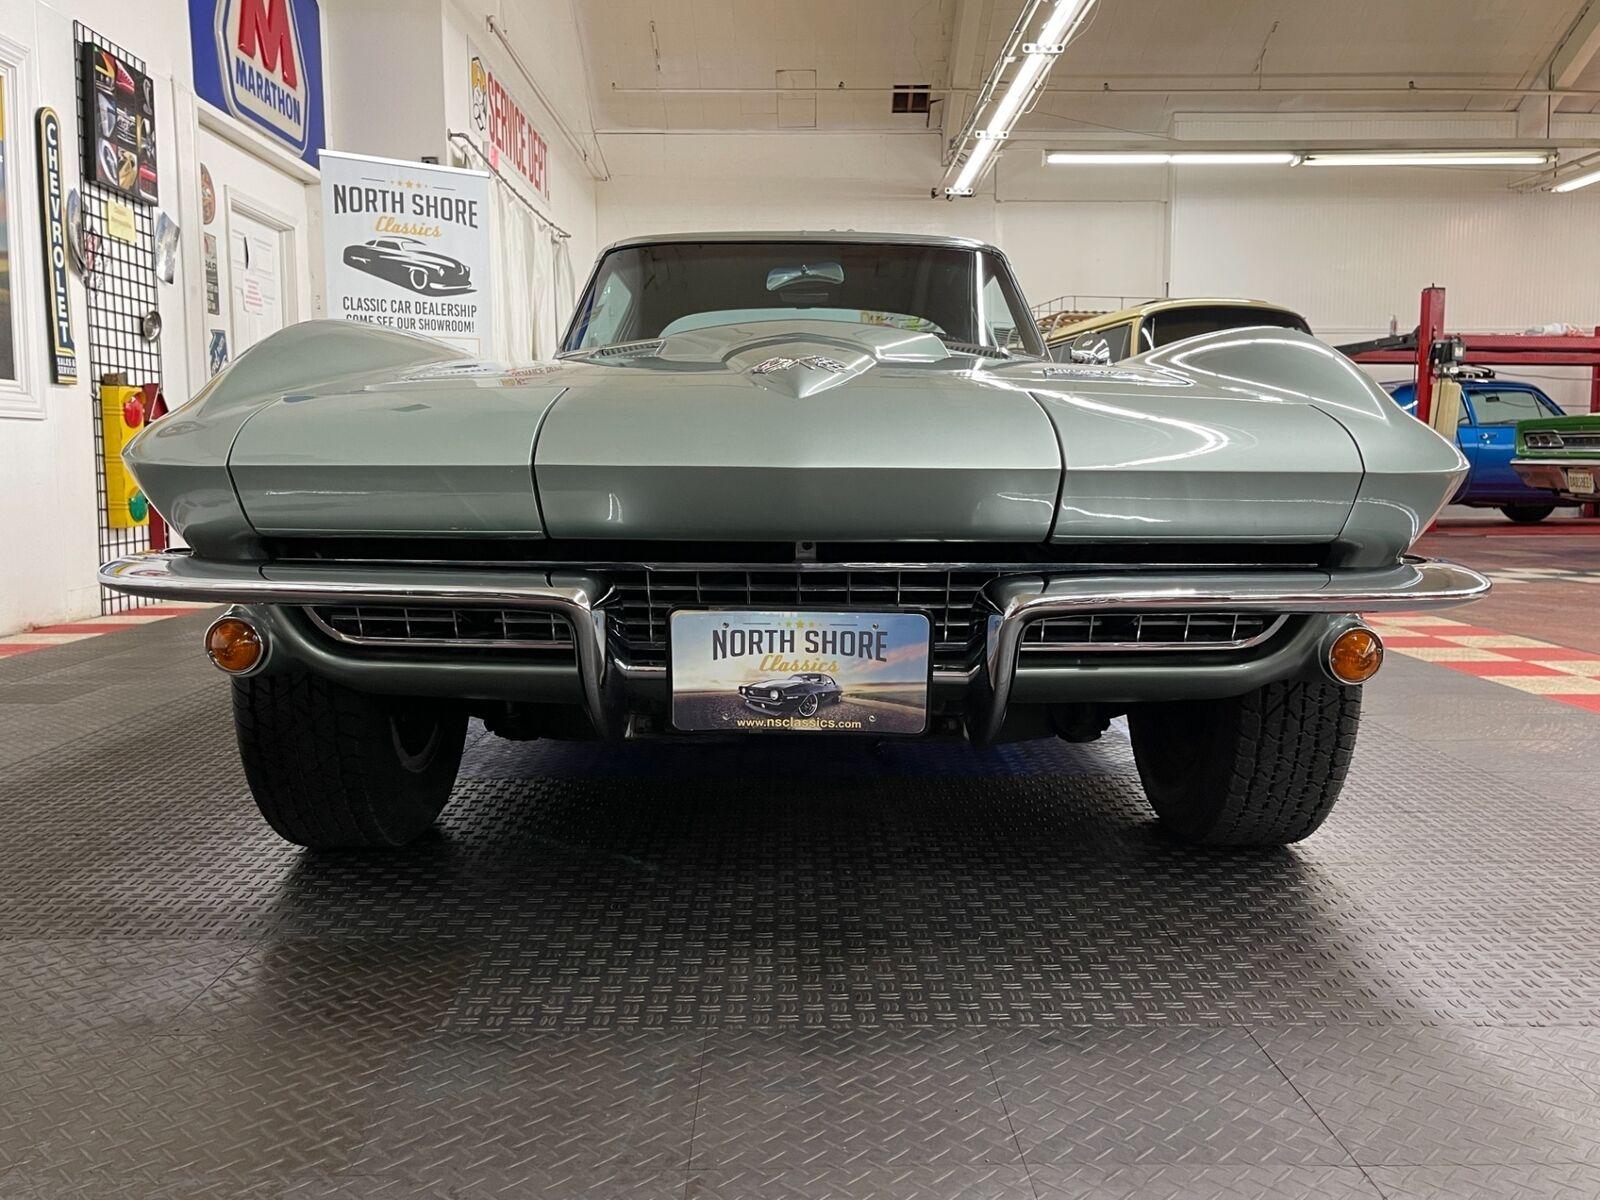 1966 Green Chevrolet Corvette Coupe  | C2 Corvette Photo 7